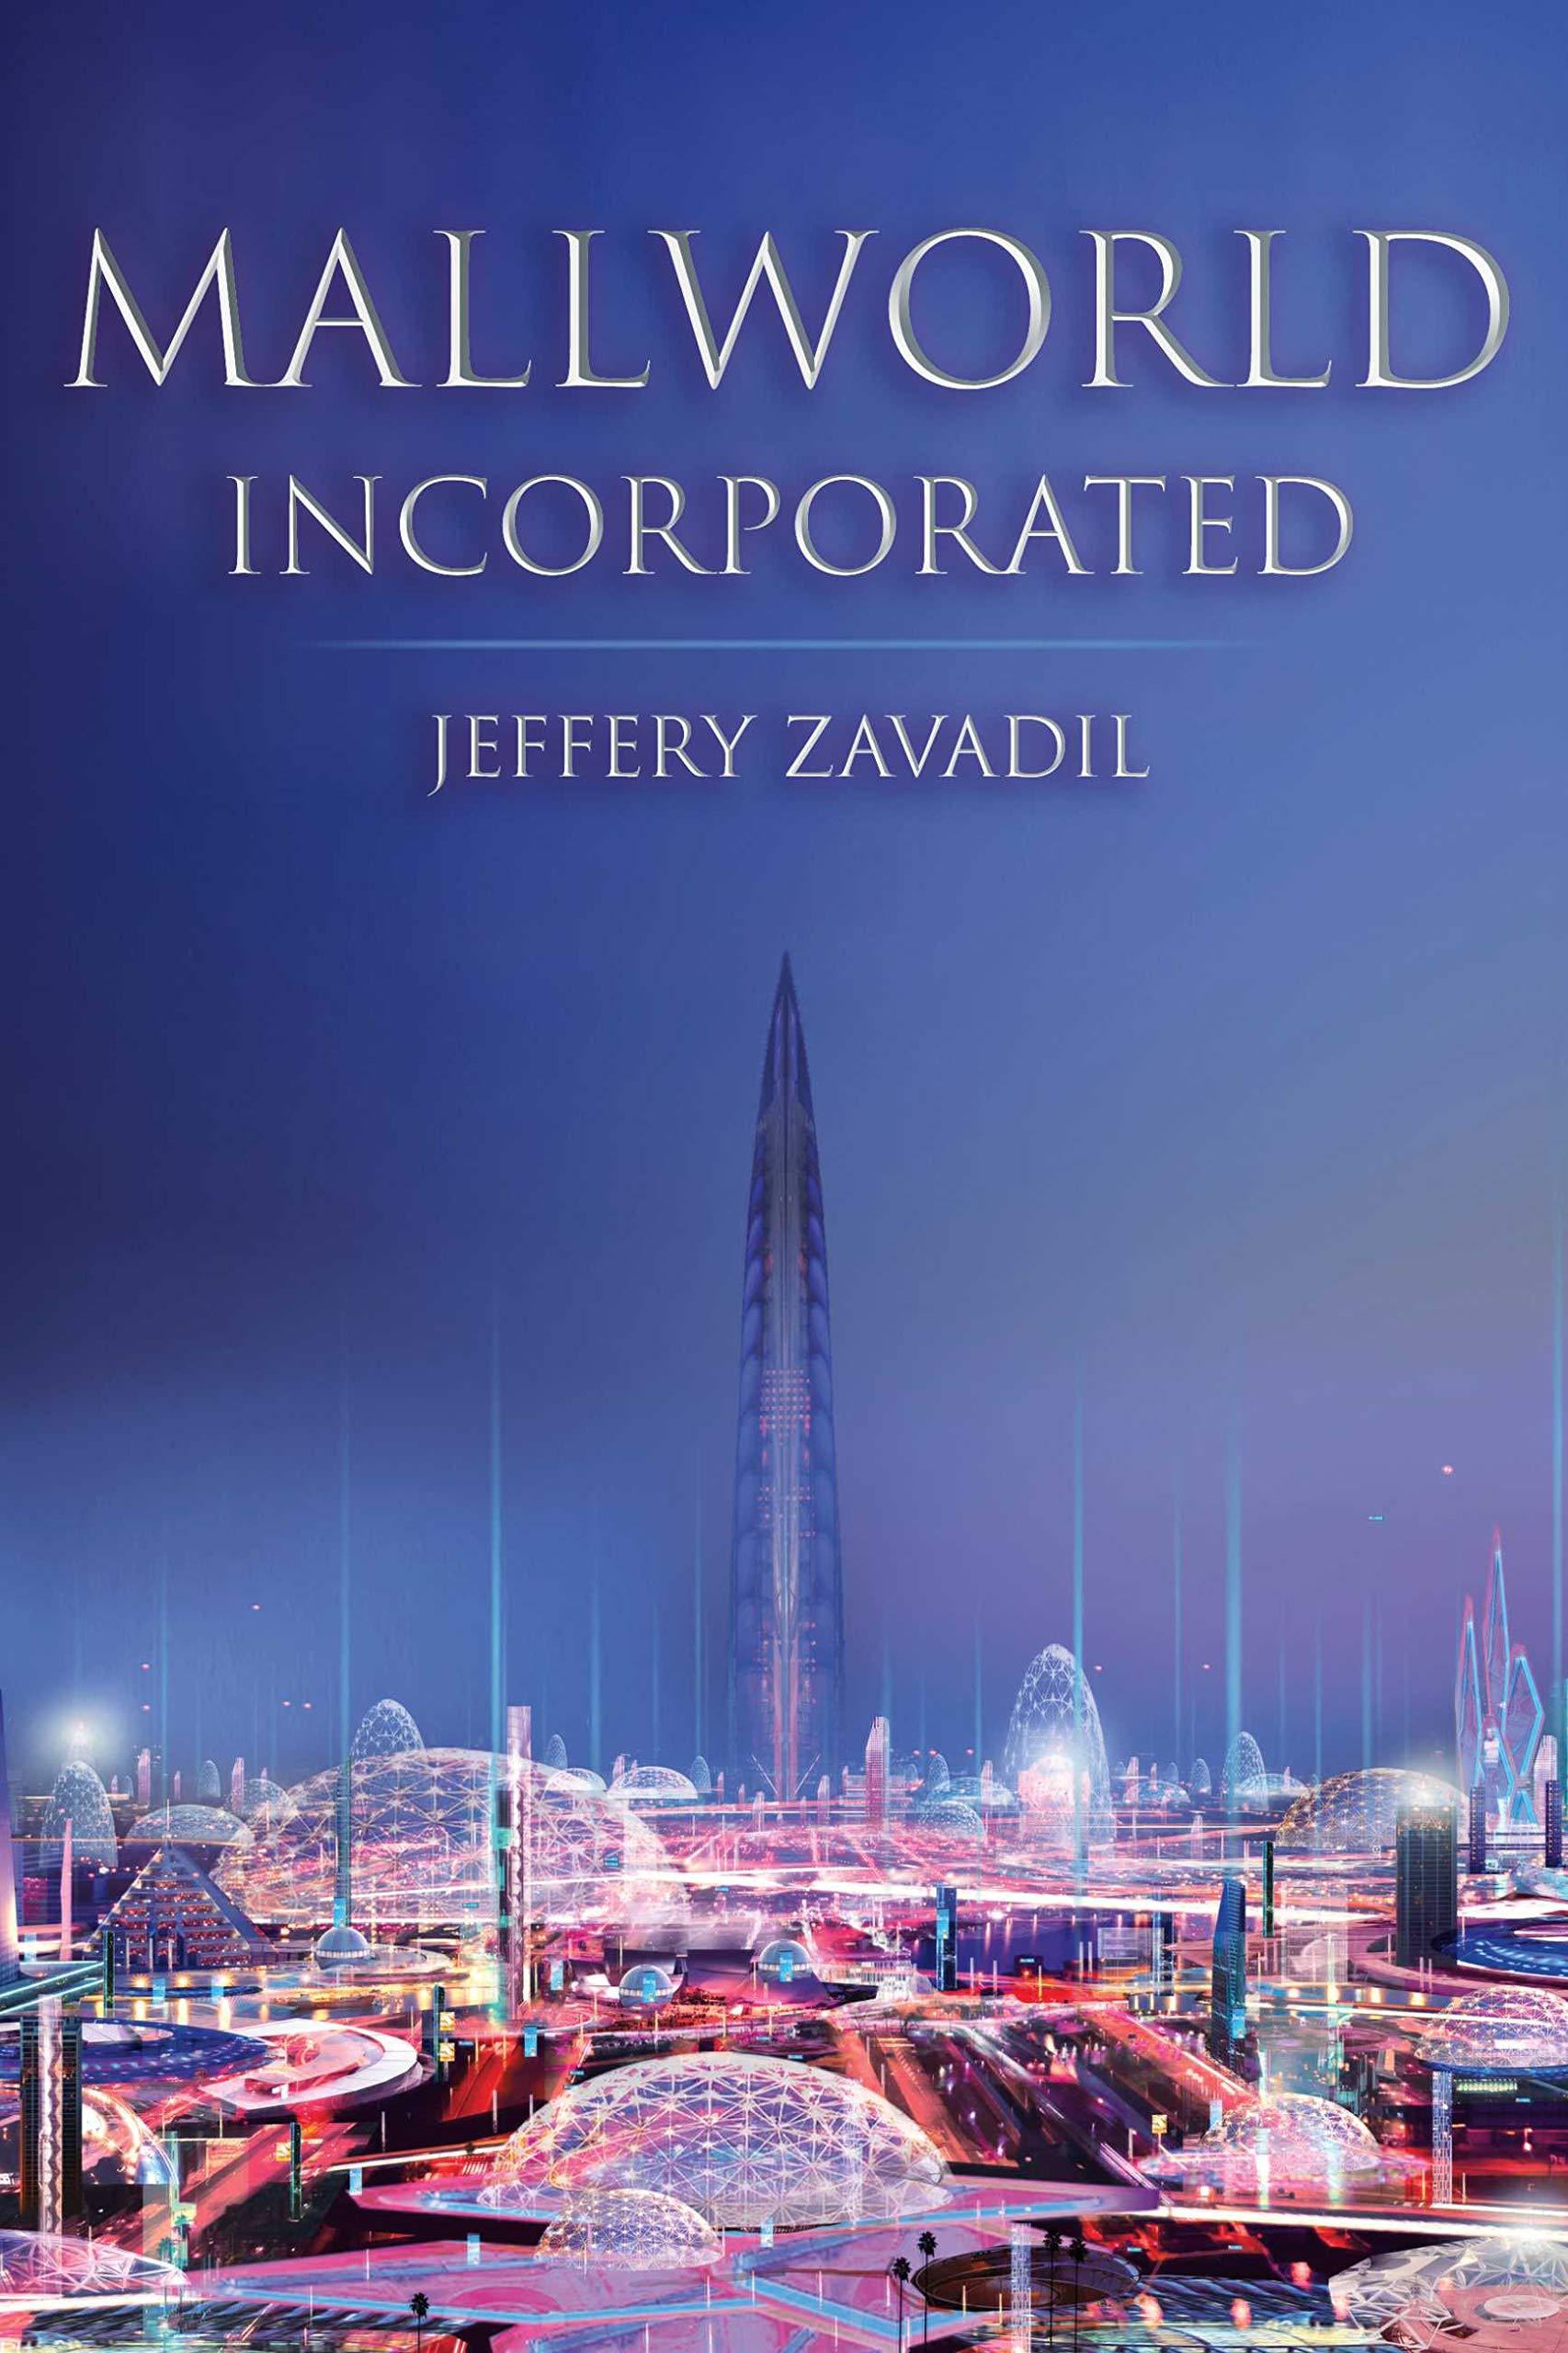 Mallworld, Incorporated (The Mallworld-ReBound Trilogy Book 1)